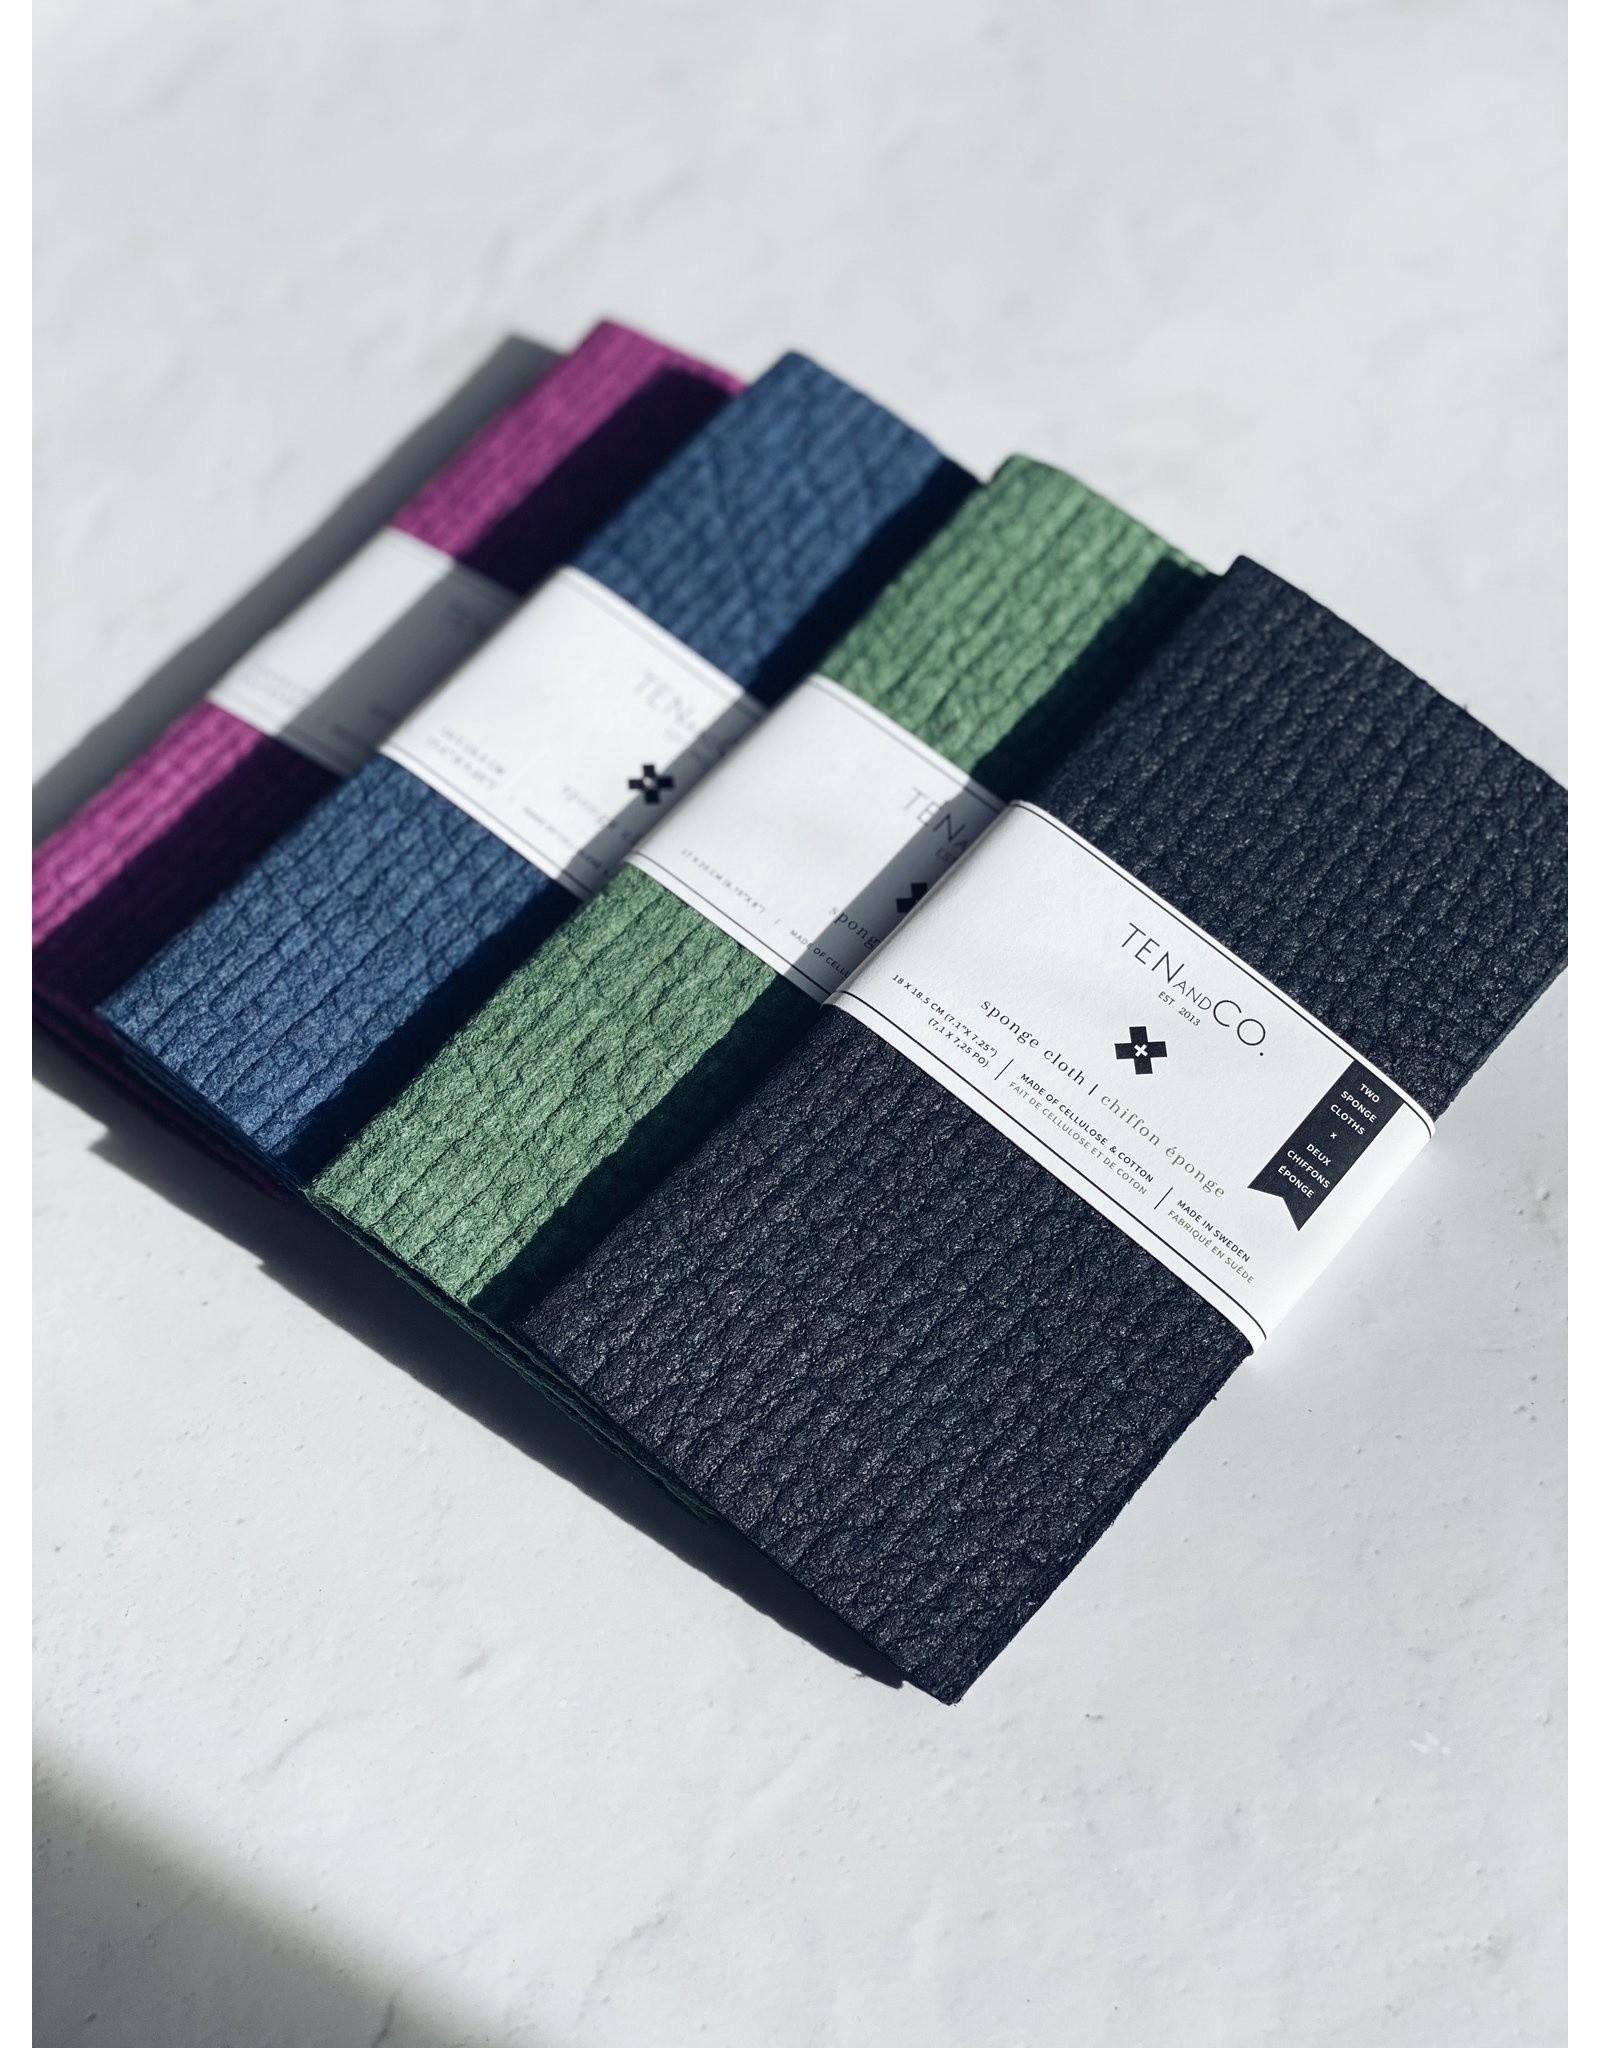 Ten & Co Sponge Cloth - 2 Pack